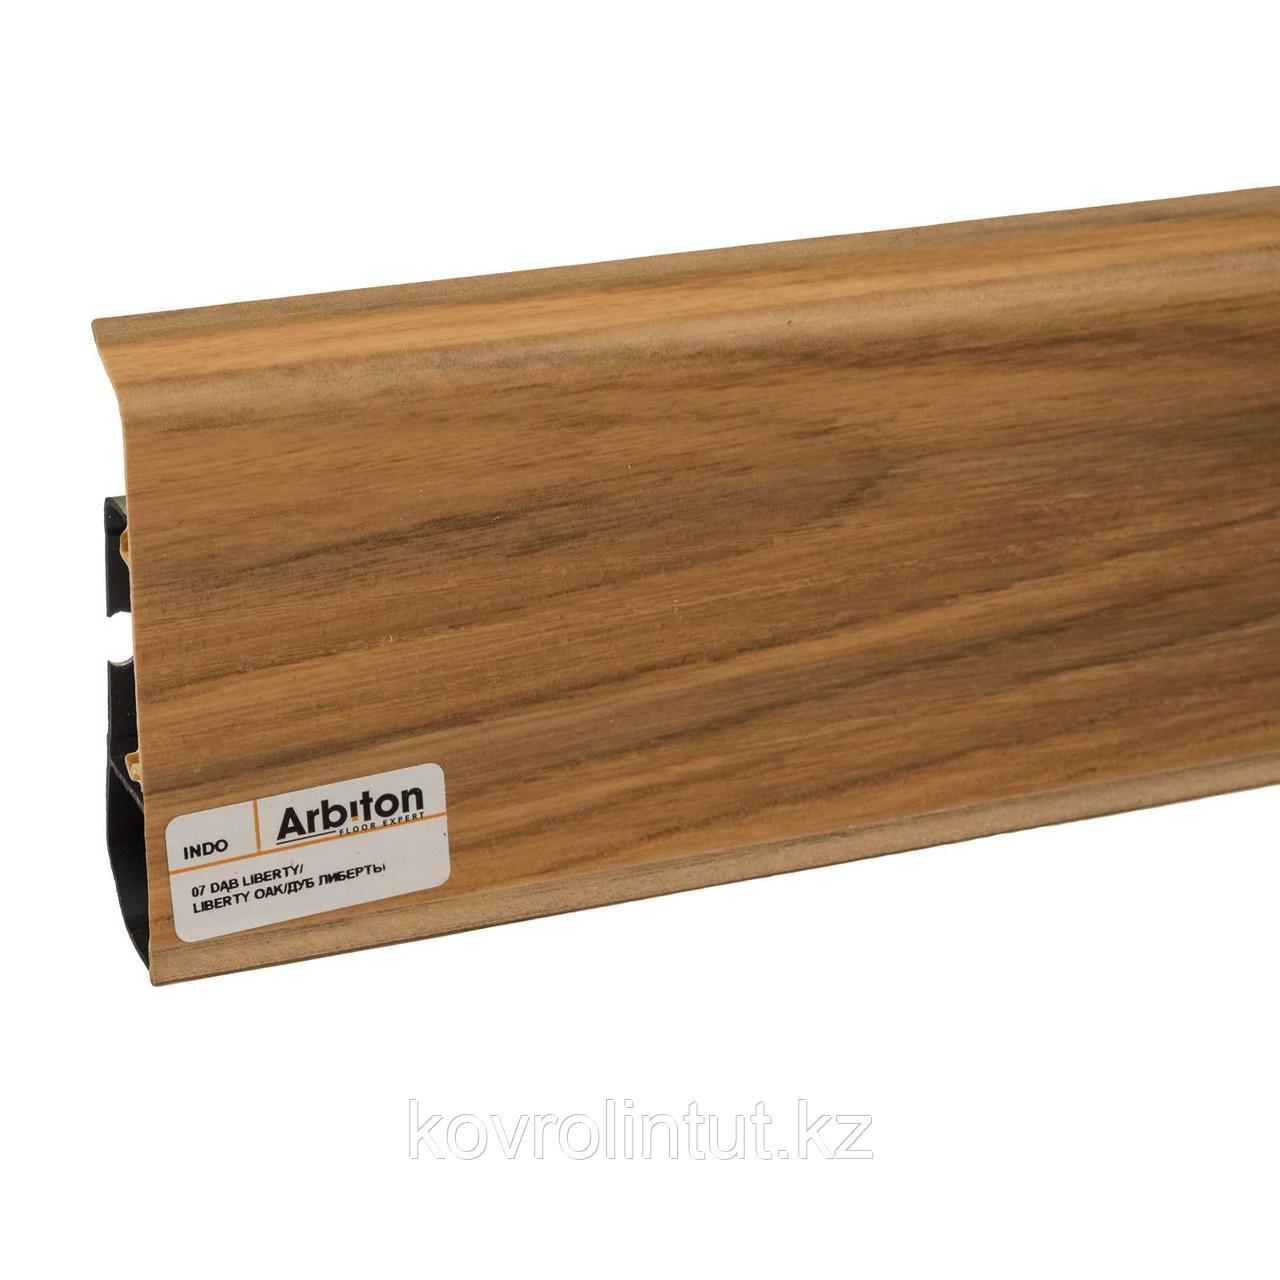 Плинтус Arbiton Indo 07, Дуб Либерти, 2500х70х26 мм